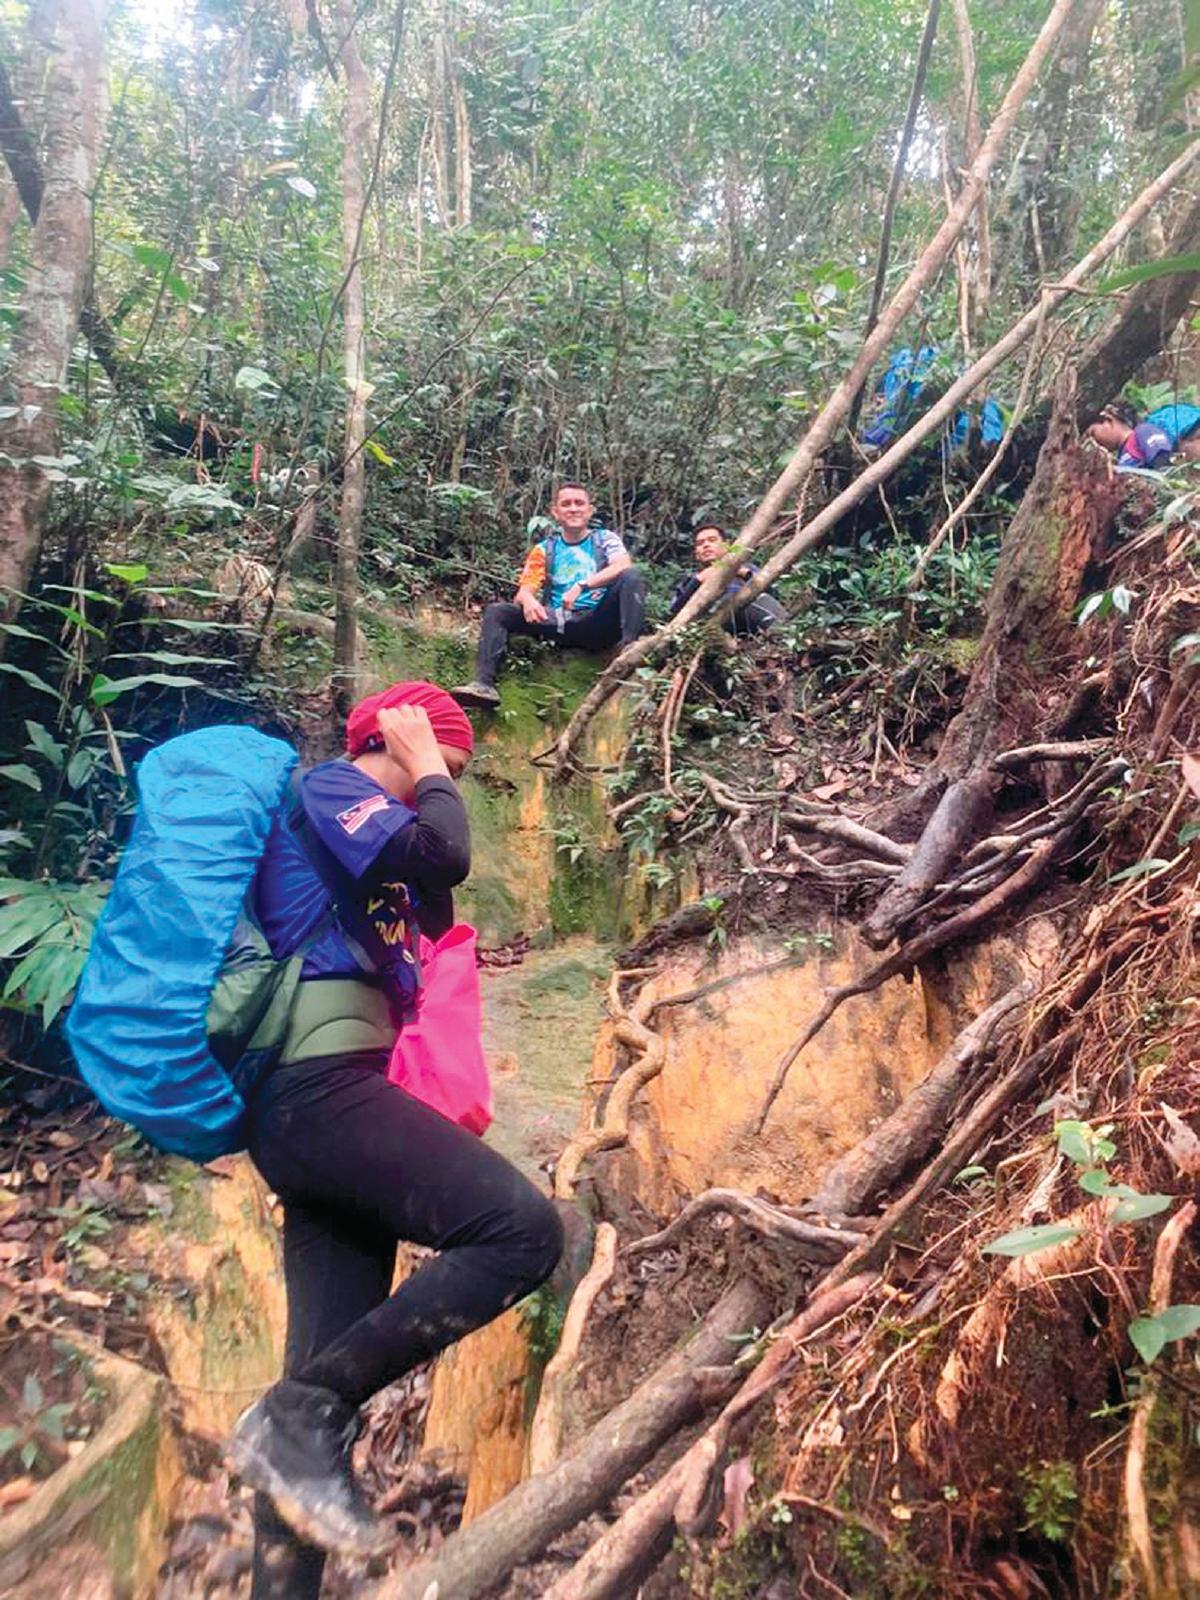 AKAR kayu menjadi tempat berpegang untuk memanjat dan menuruni tebing.